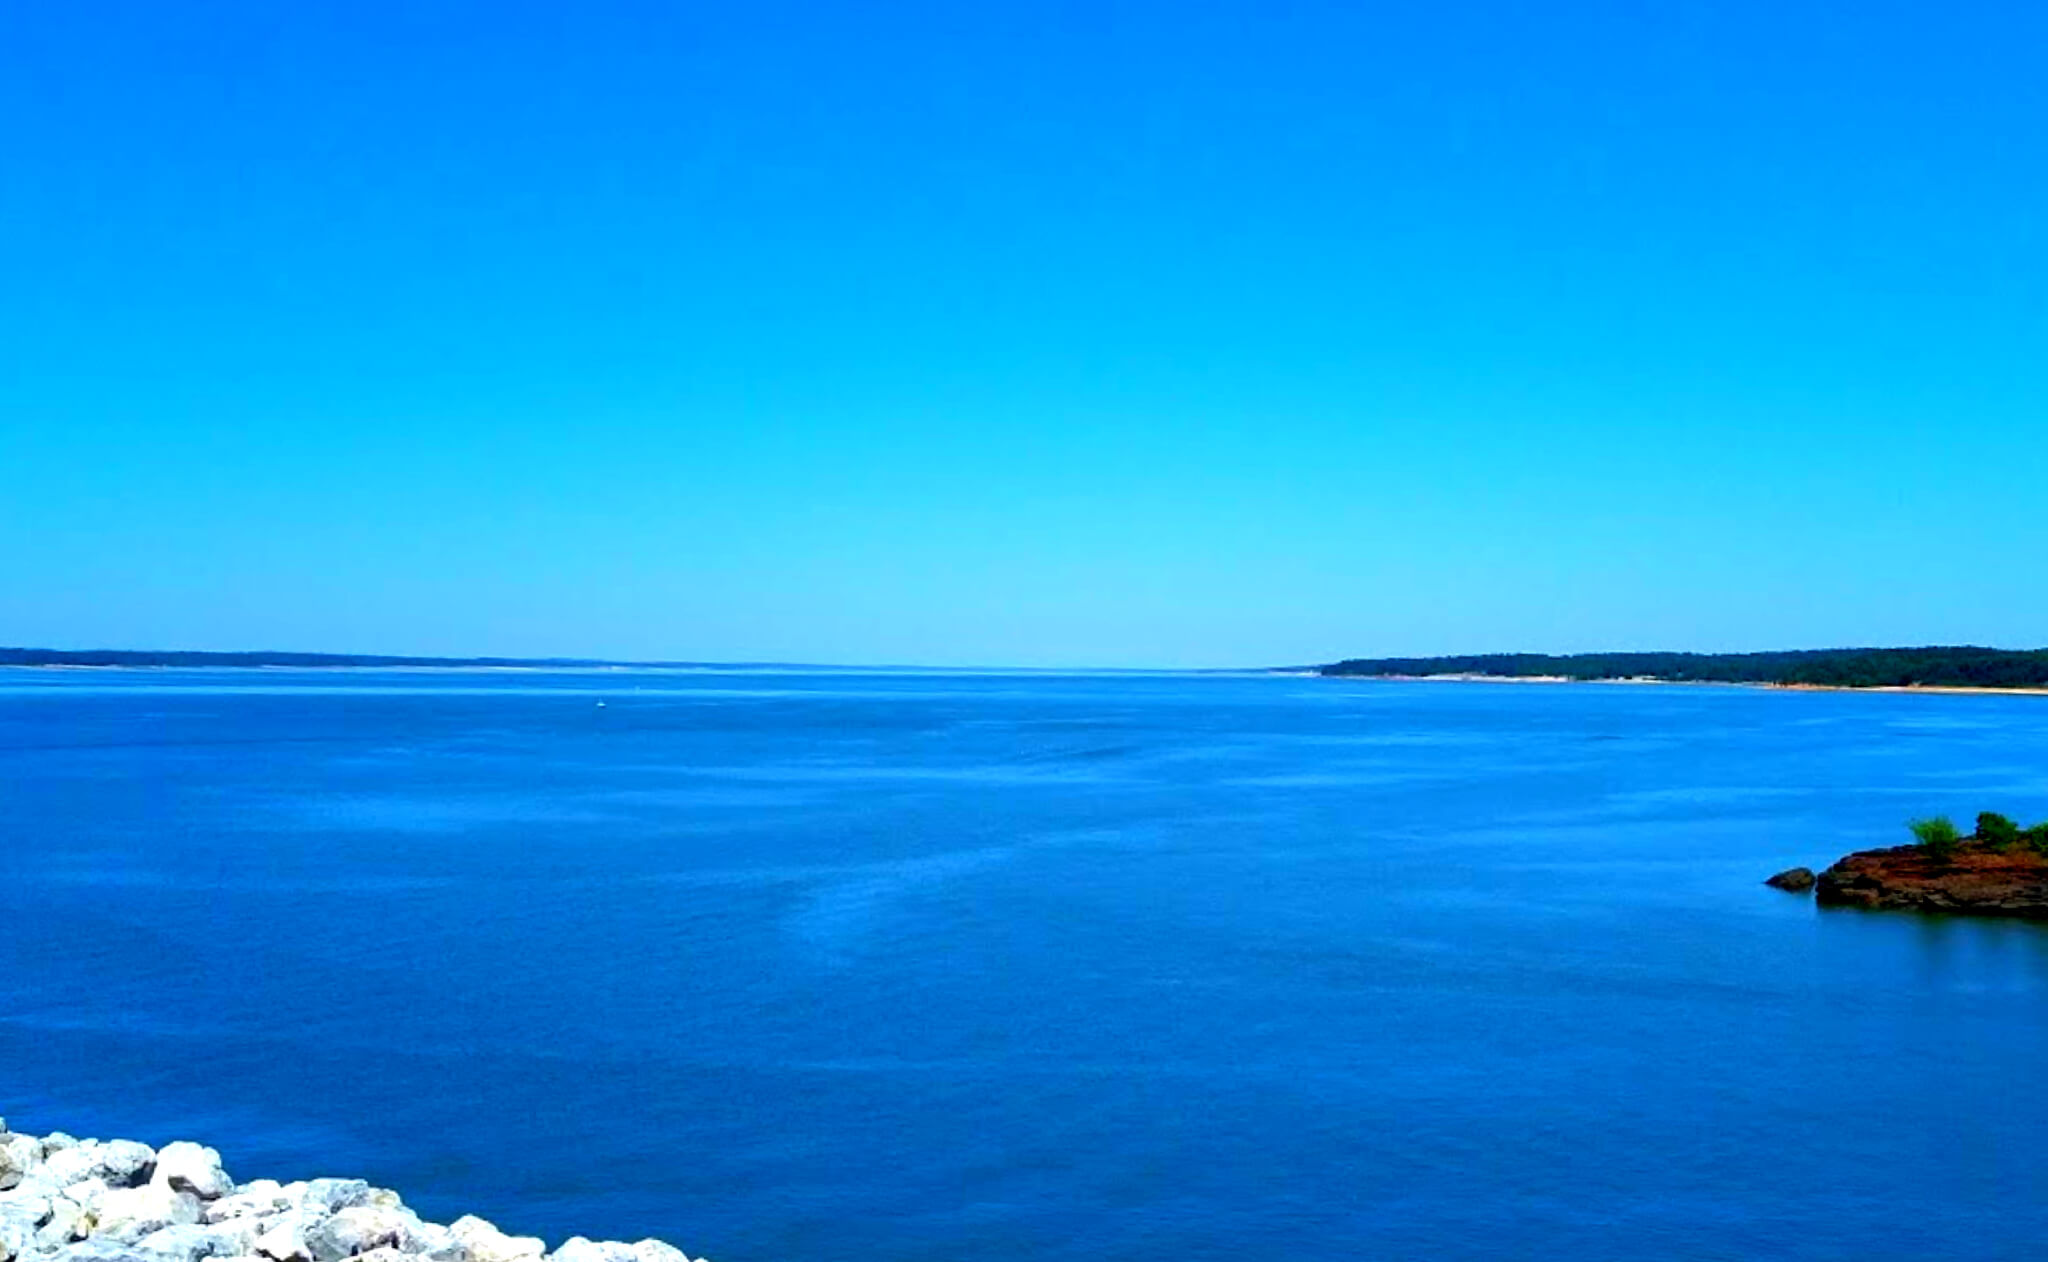 Sardis-Lake-Fishing-Report-Guide-Mississippi-MS-01